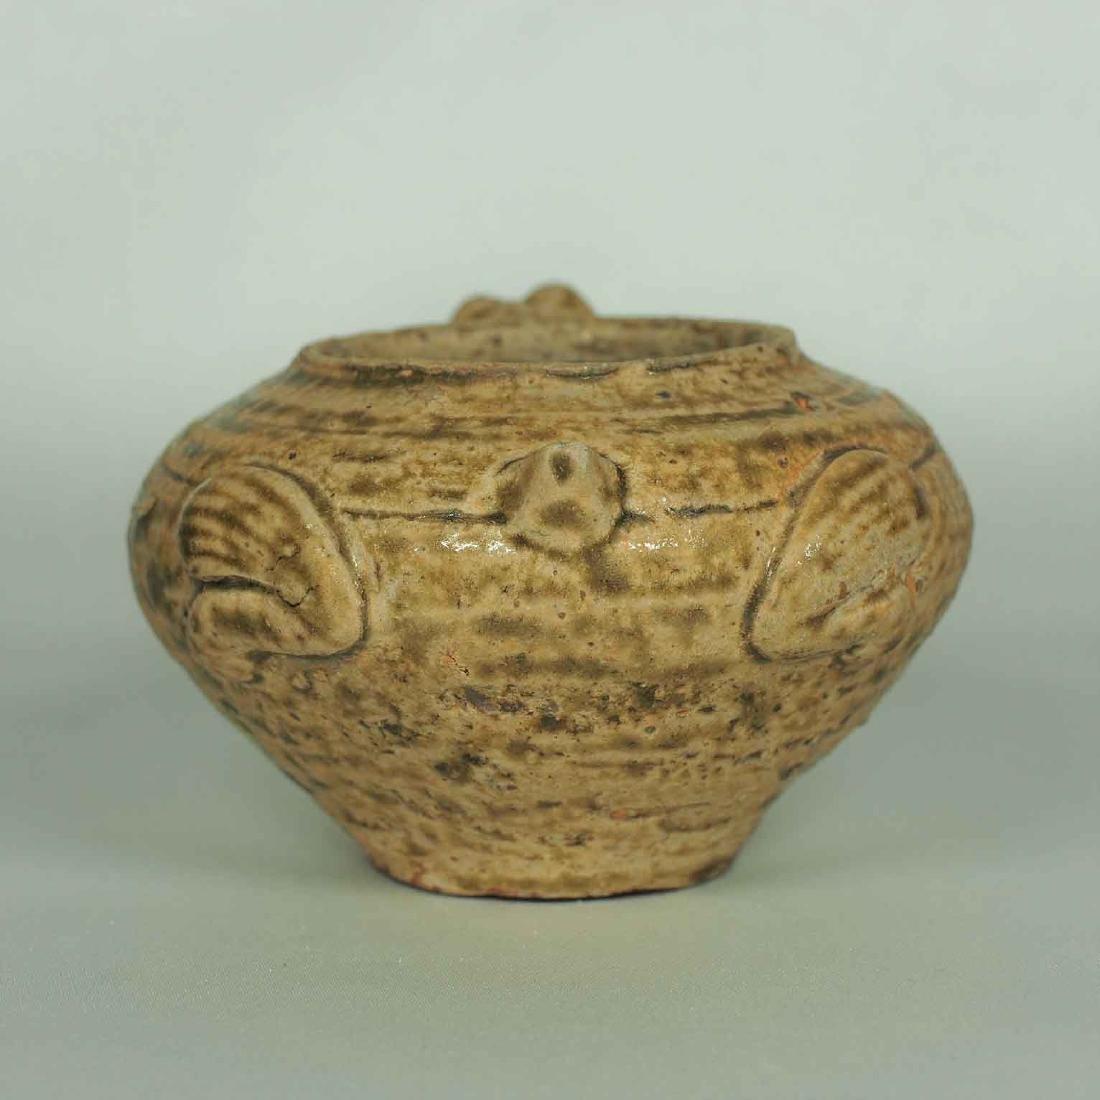 Proto-Porcelain Turtle-Form Water Pot, Han Dynasty - 4